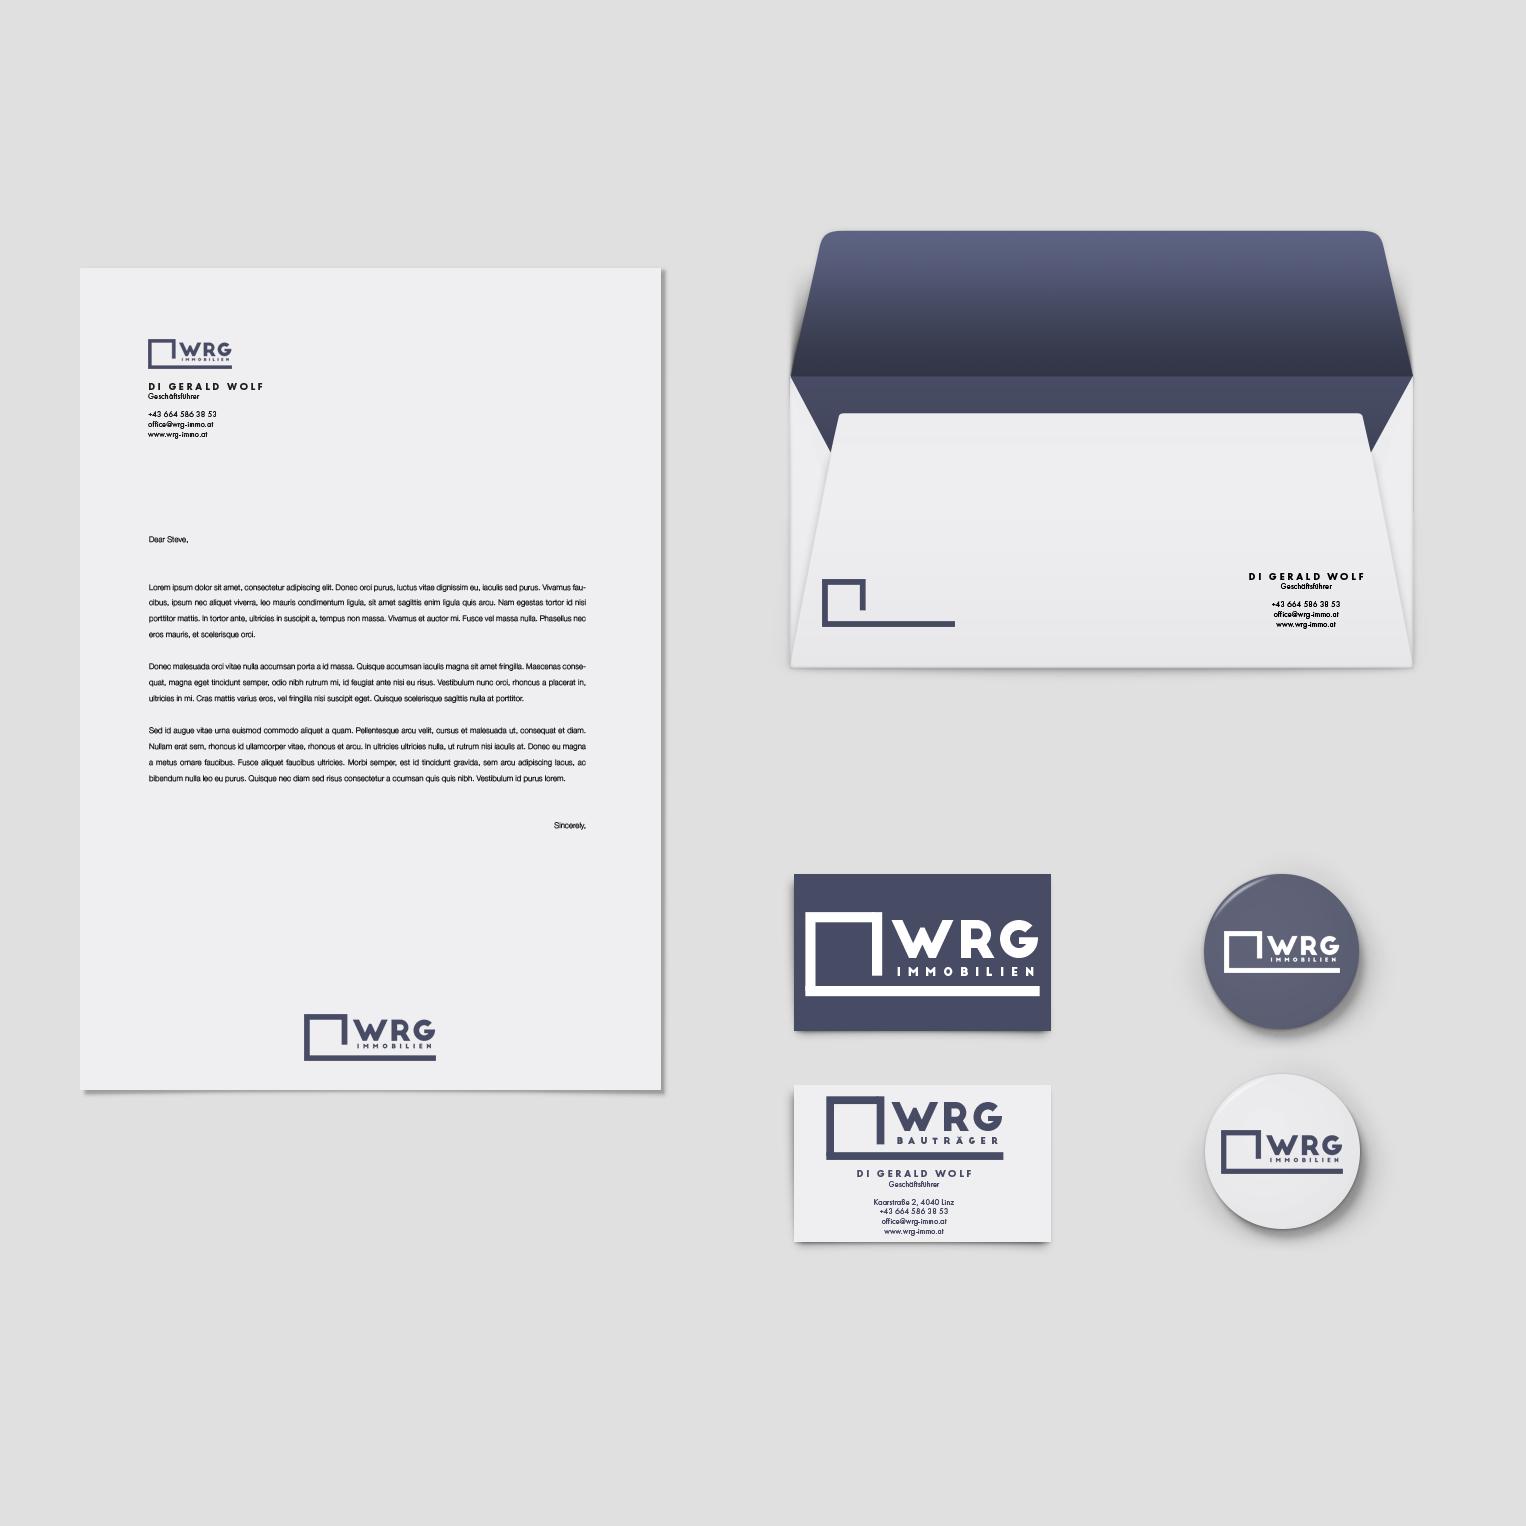 wrg_Branding_Identity